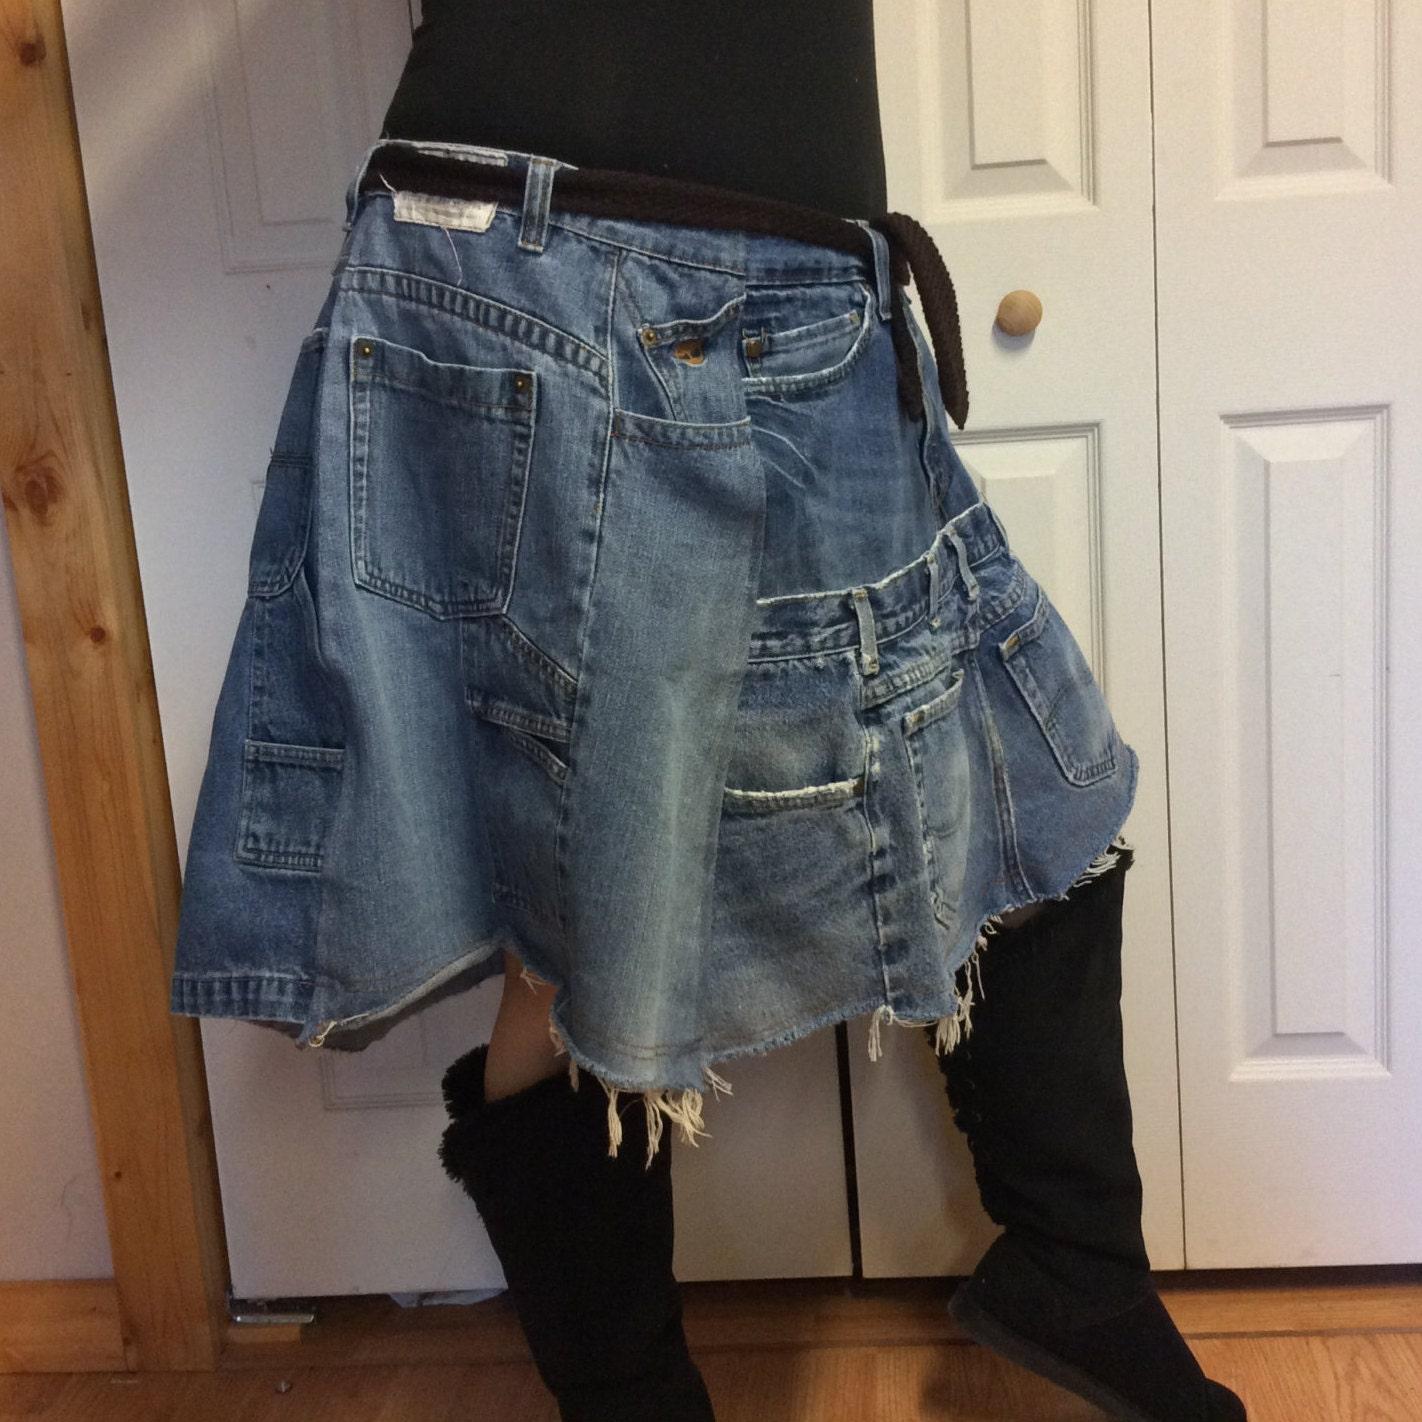 3xl jean skirt plus size skirt blue jean skirt